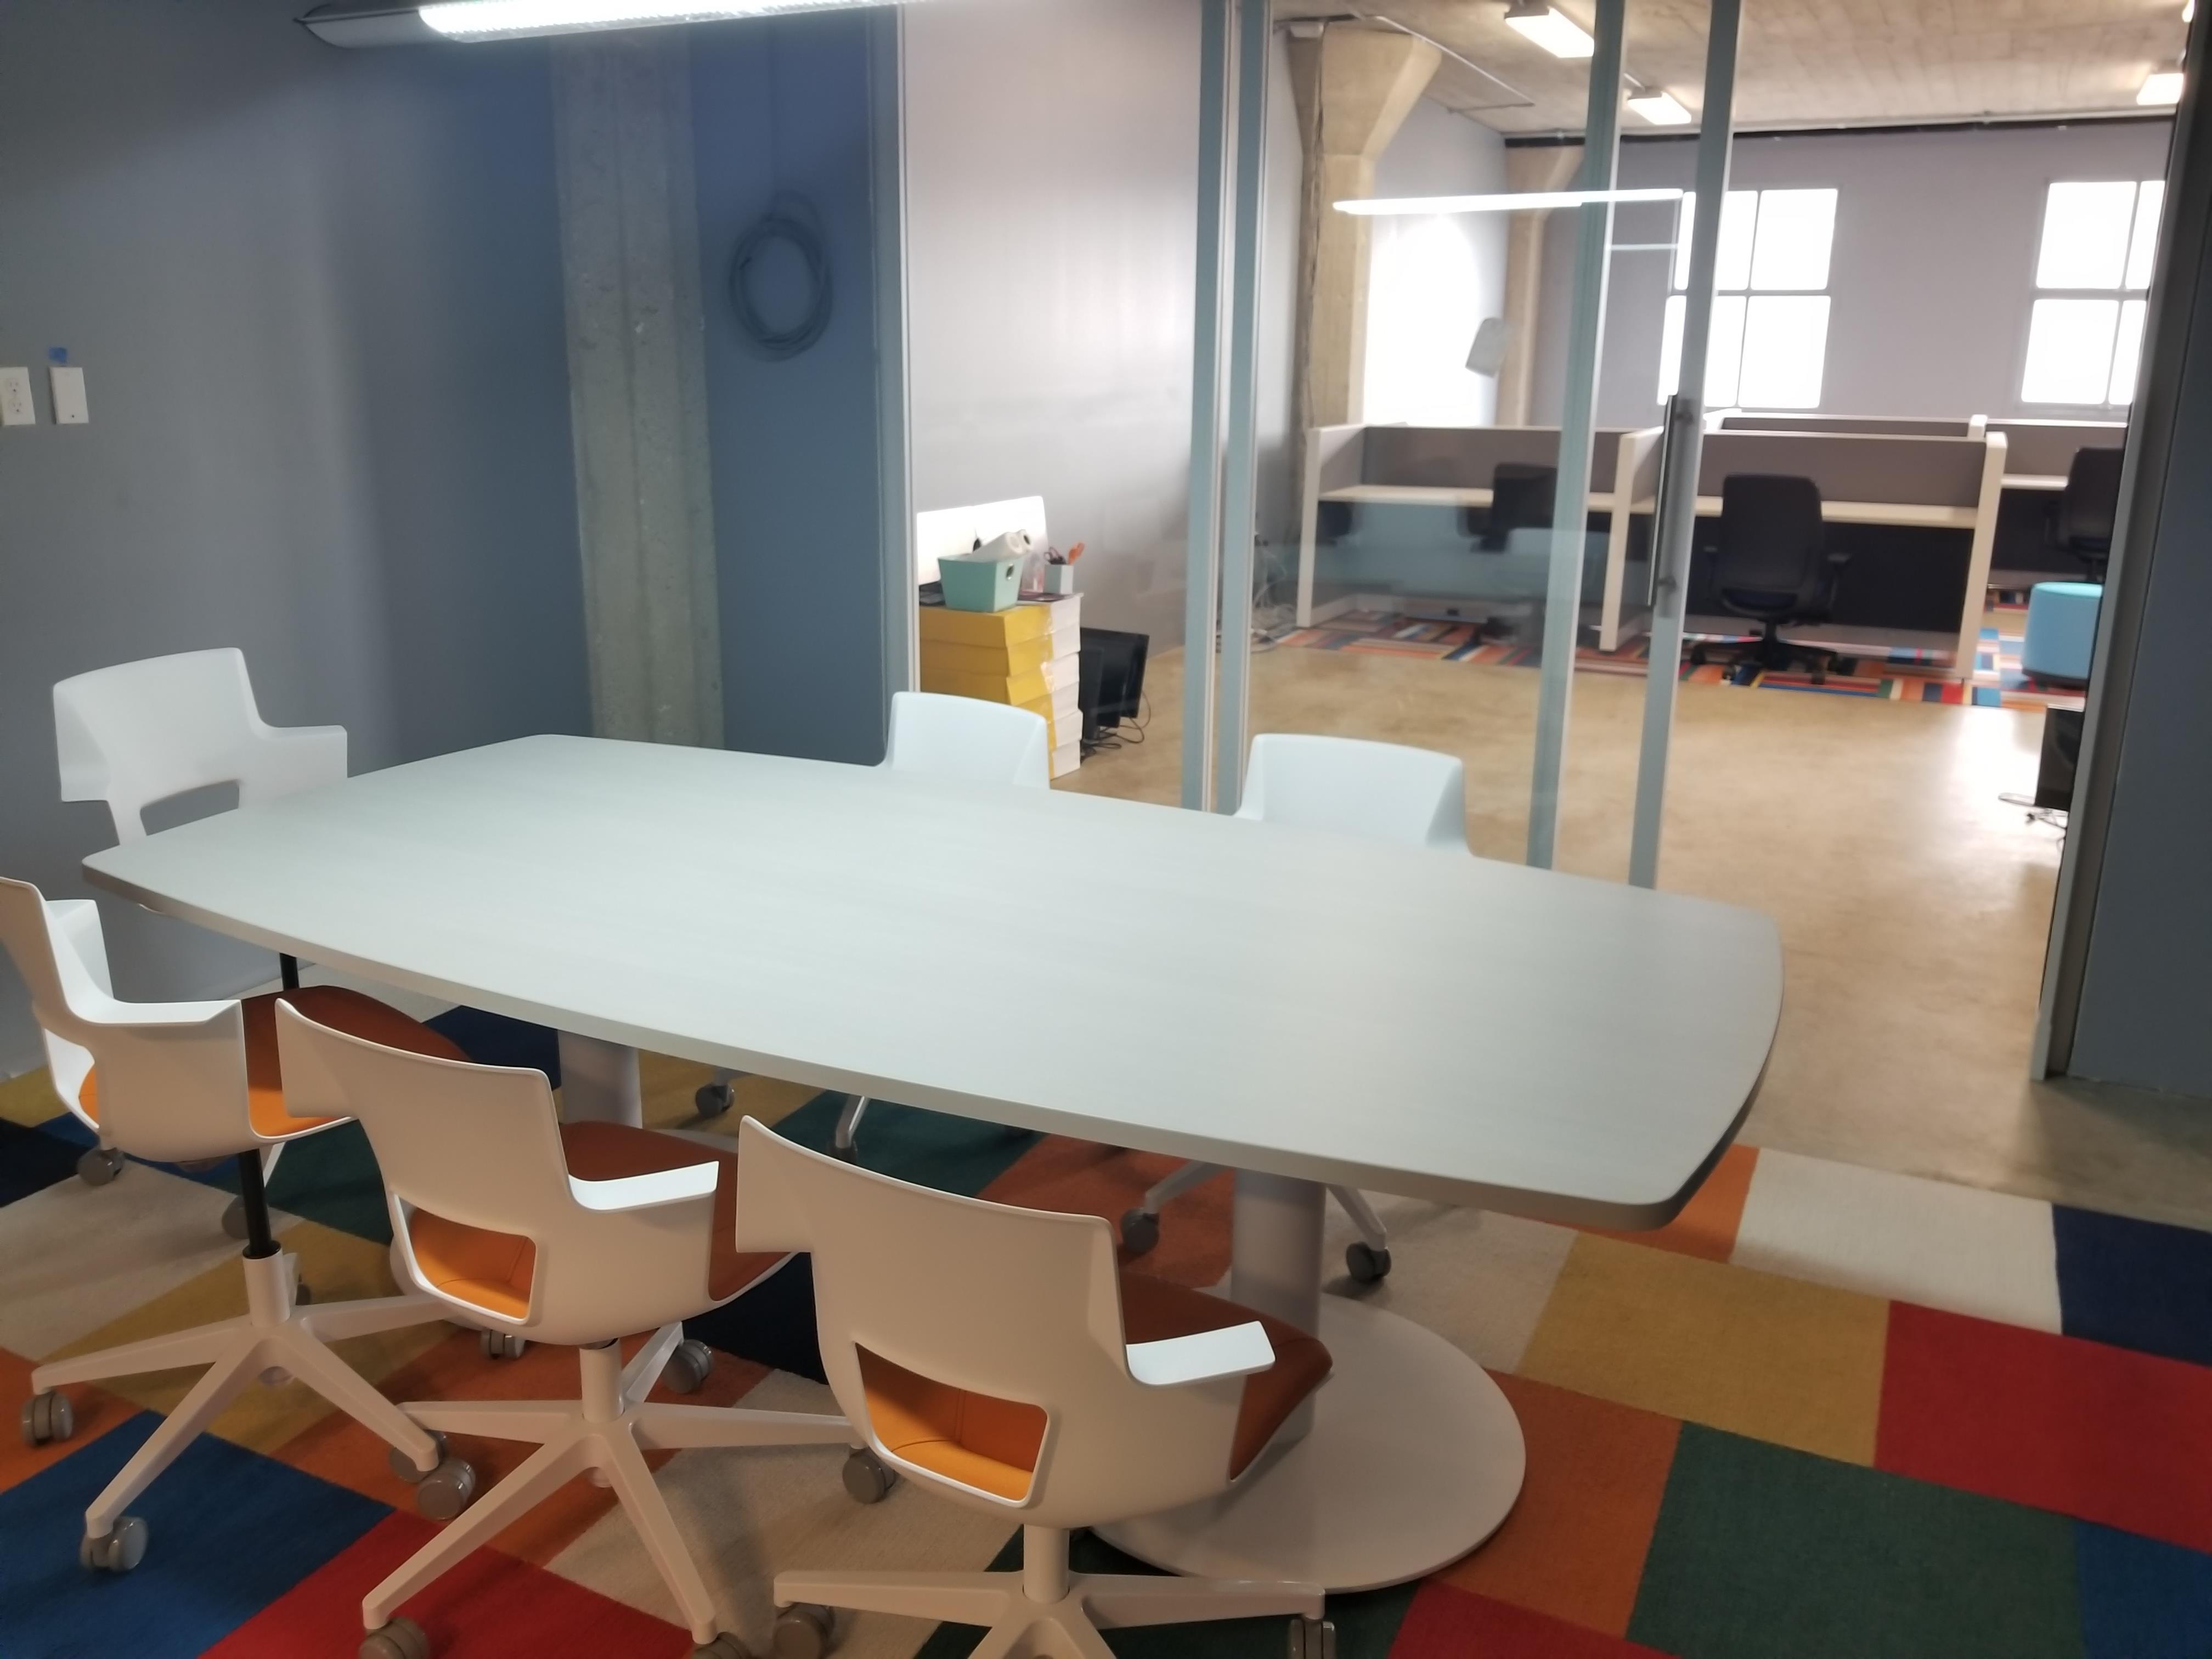 Industrial Office Space in Hip Downtown LA - Meeting Room 1